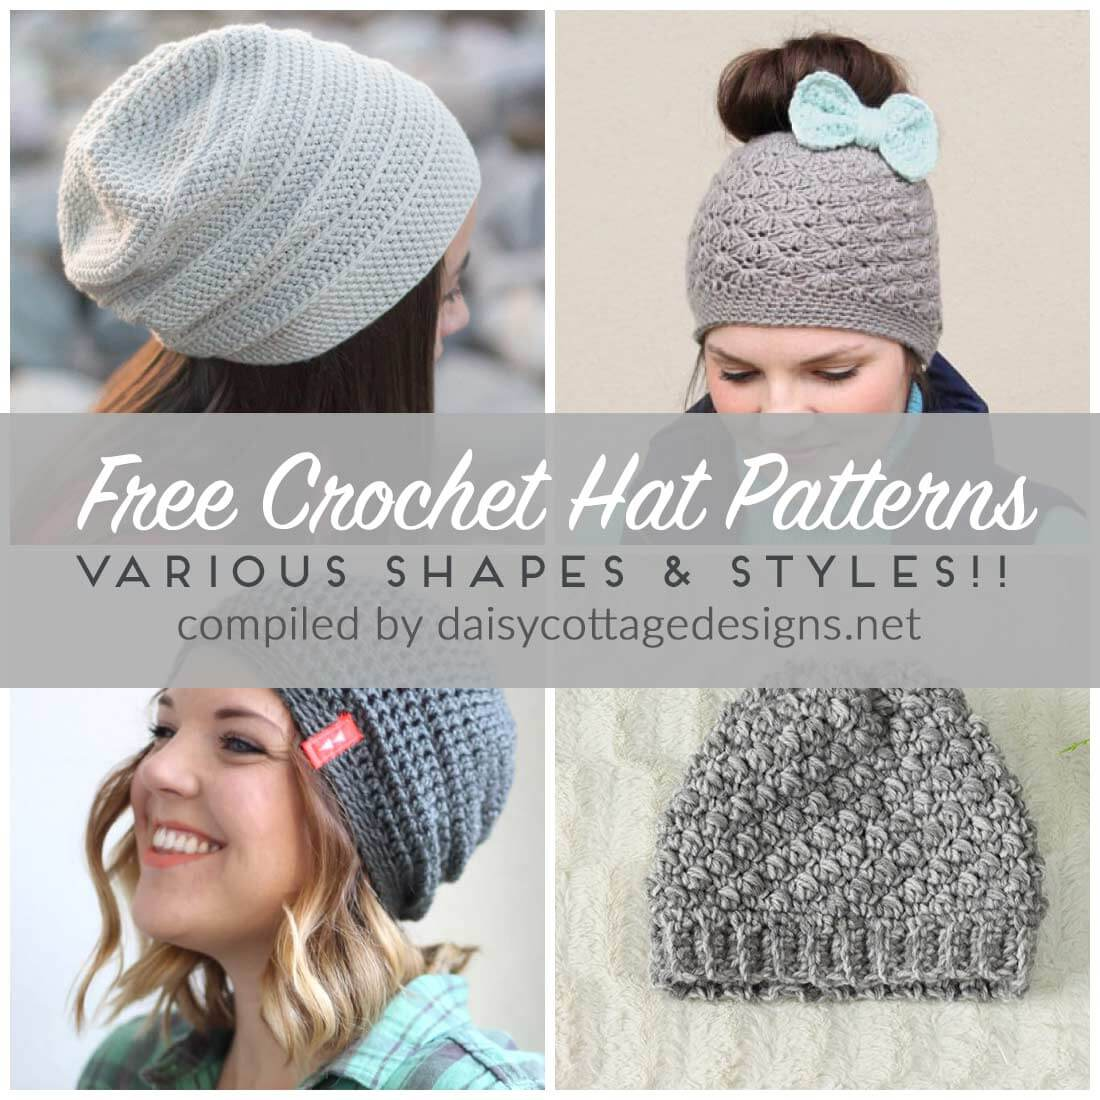 free crochet hat patterns | free crochet patterns